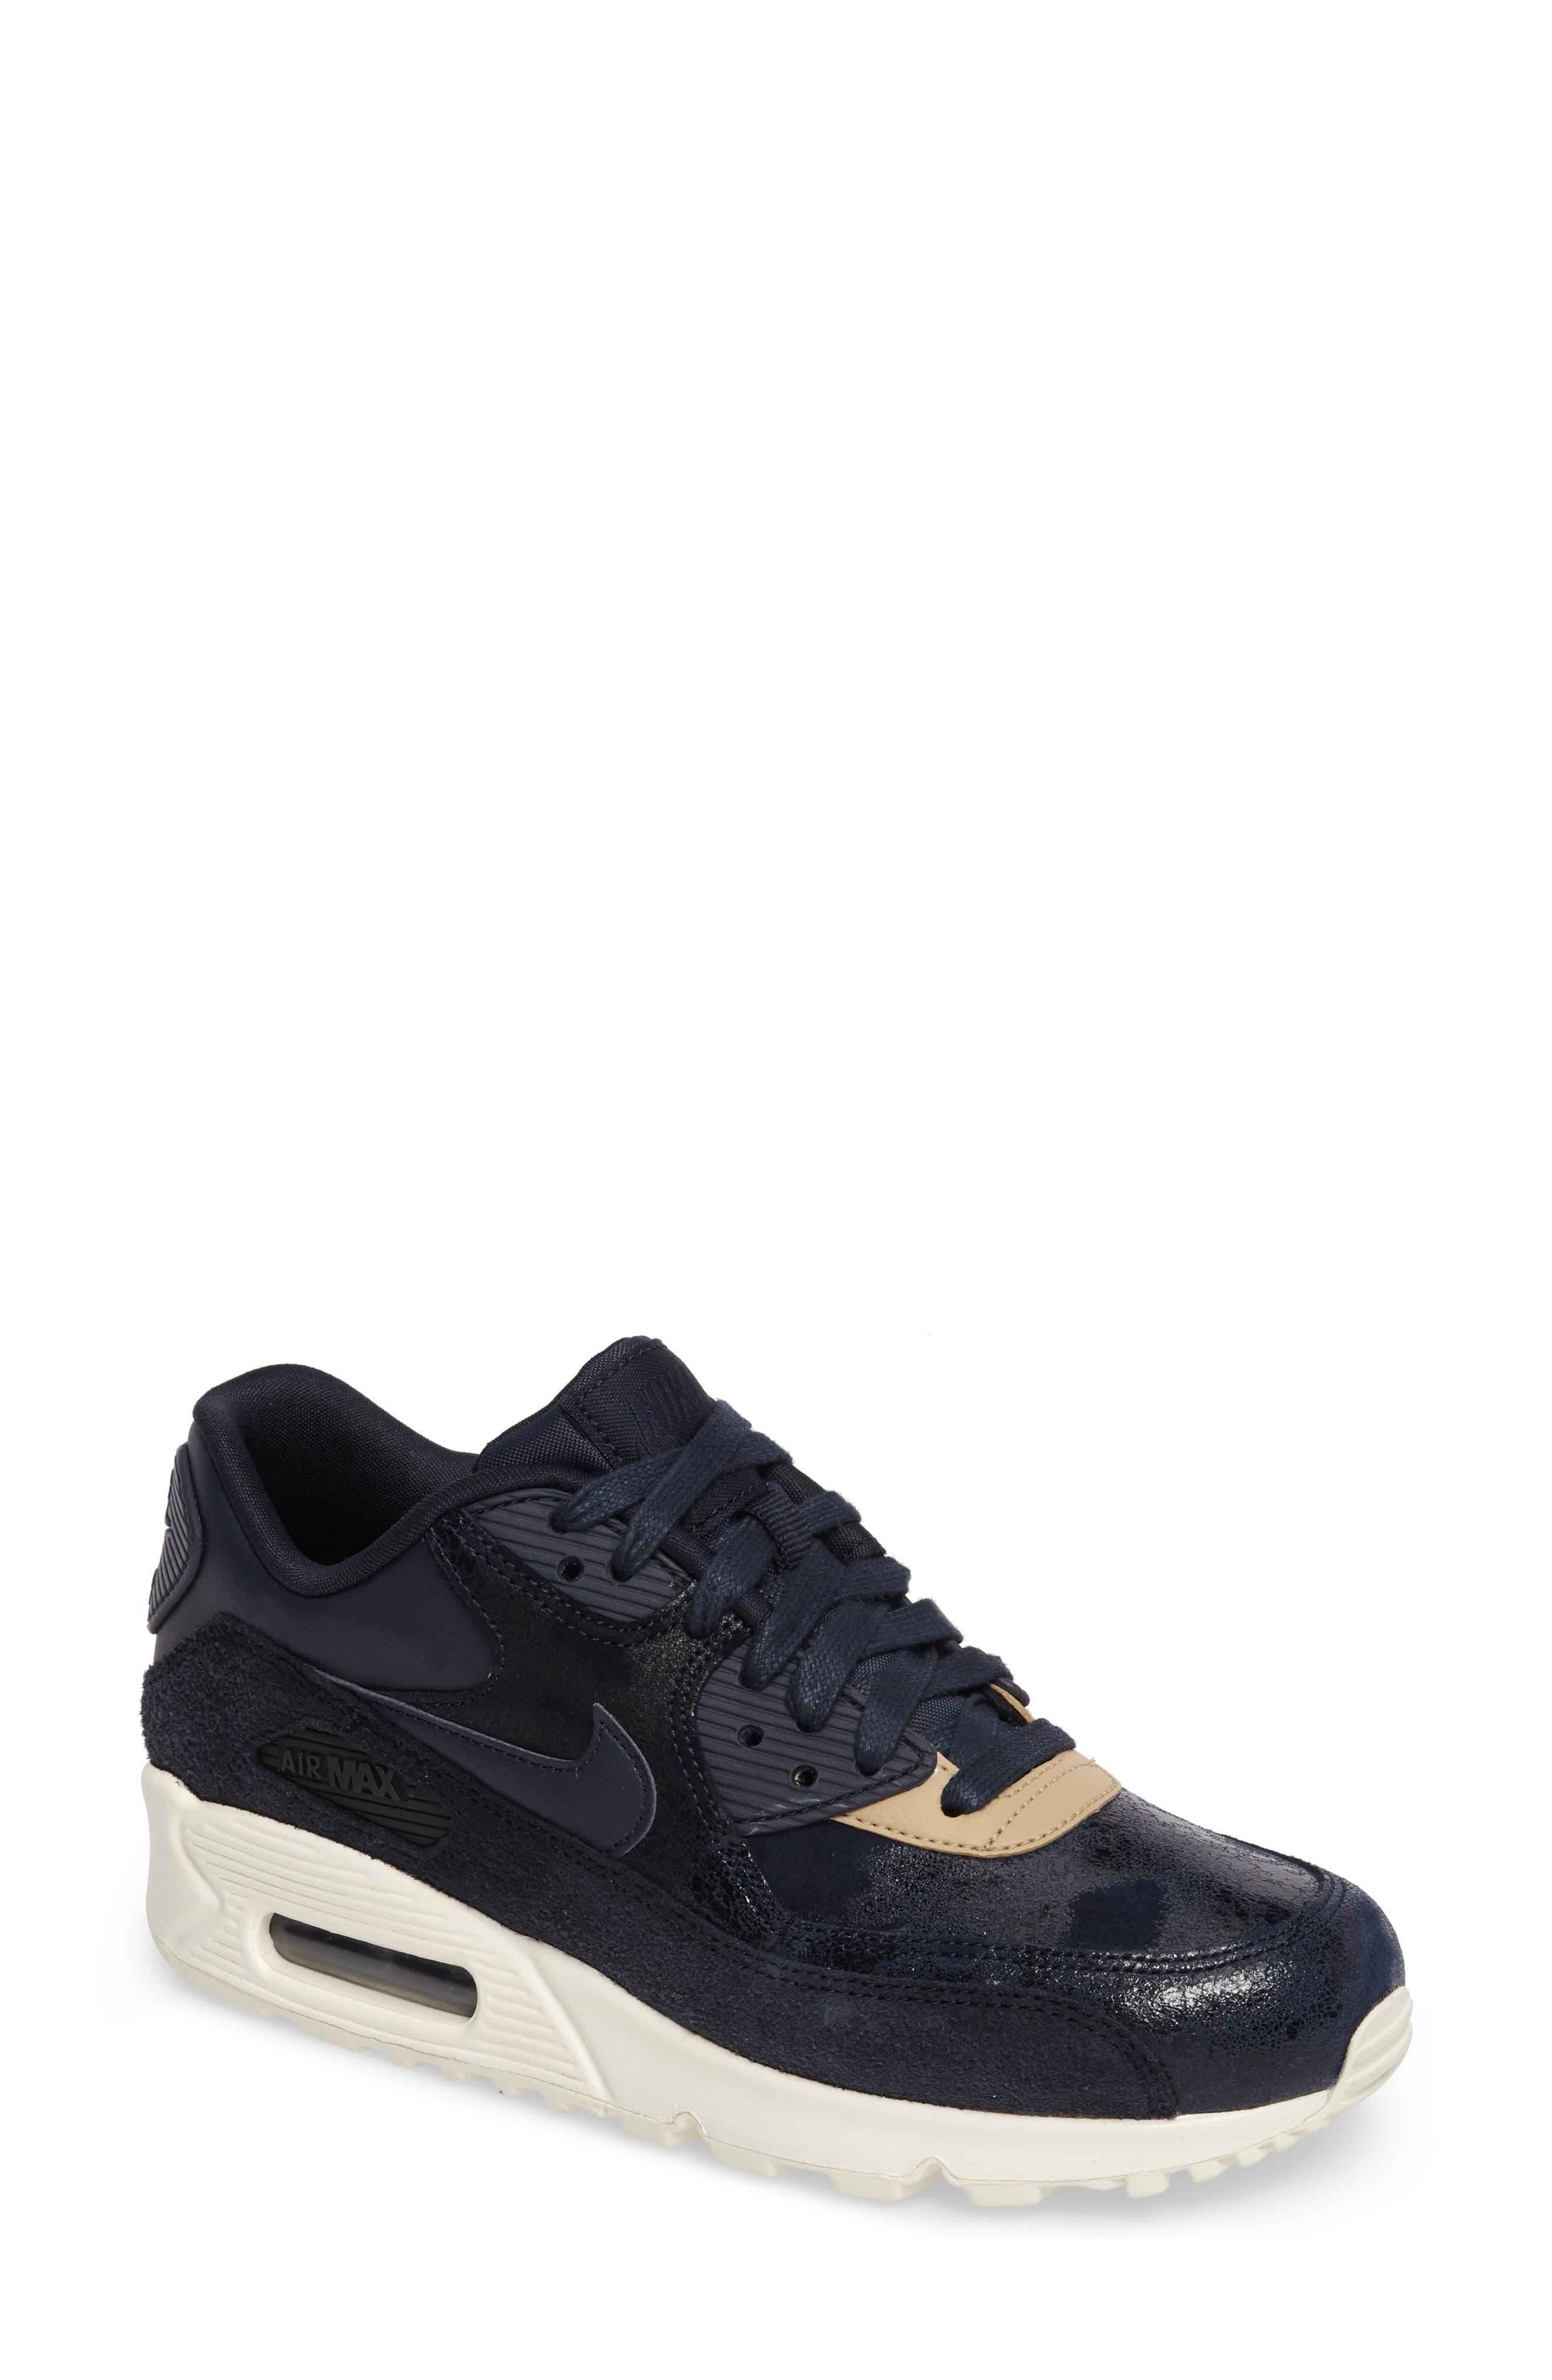 Air Max 90 Premium Sneaker,                             Main thumbnail 1, color,                             Dark Obsidian/ Sail/ Mushroom